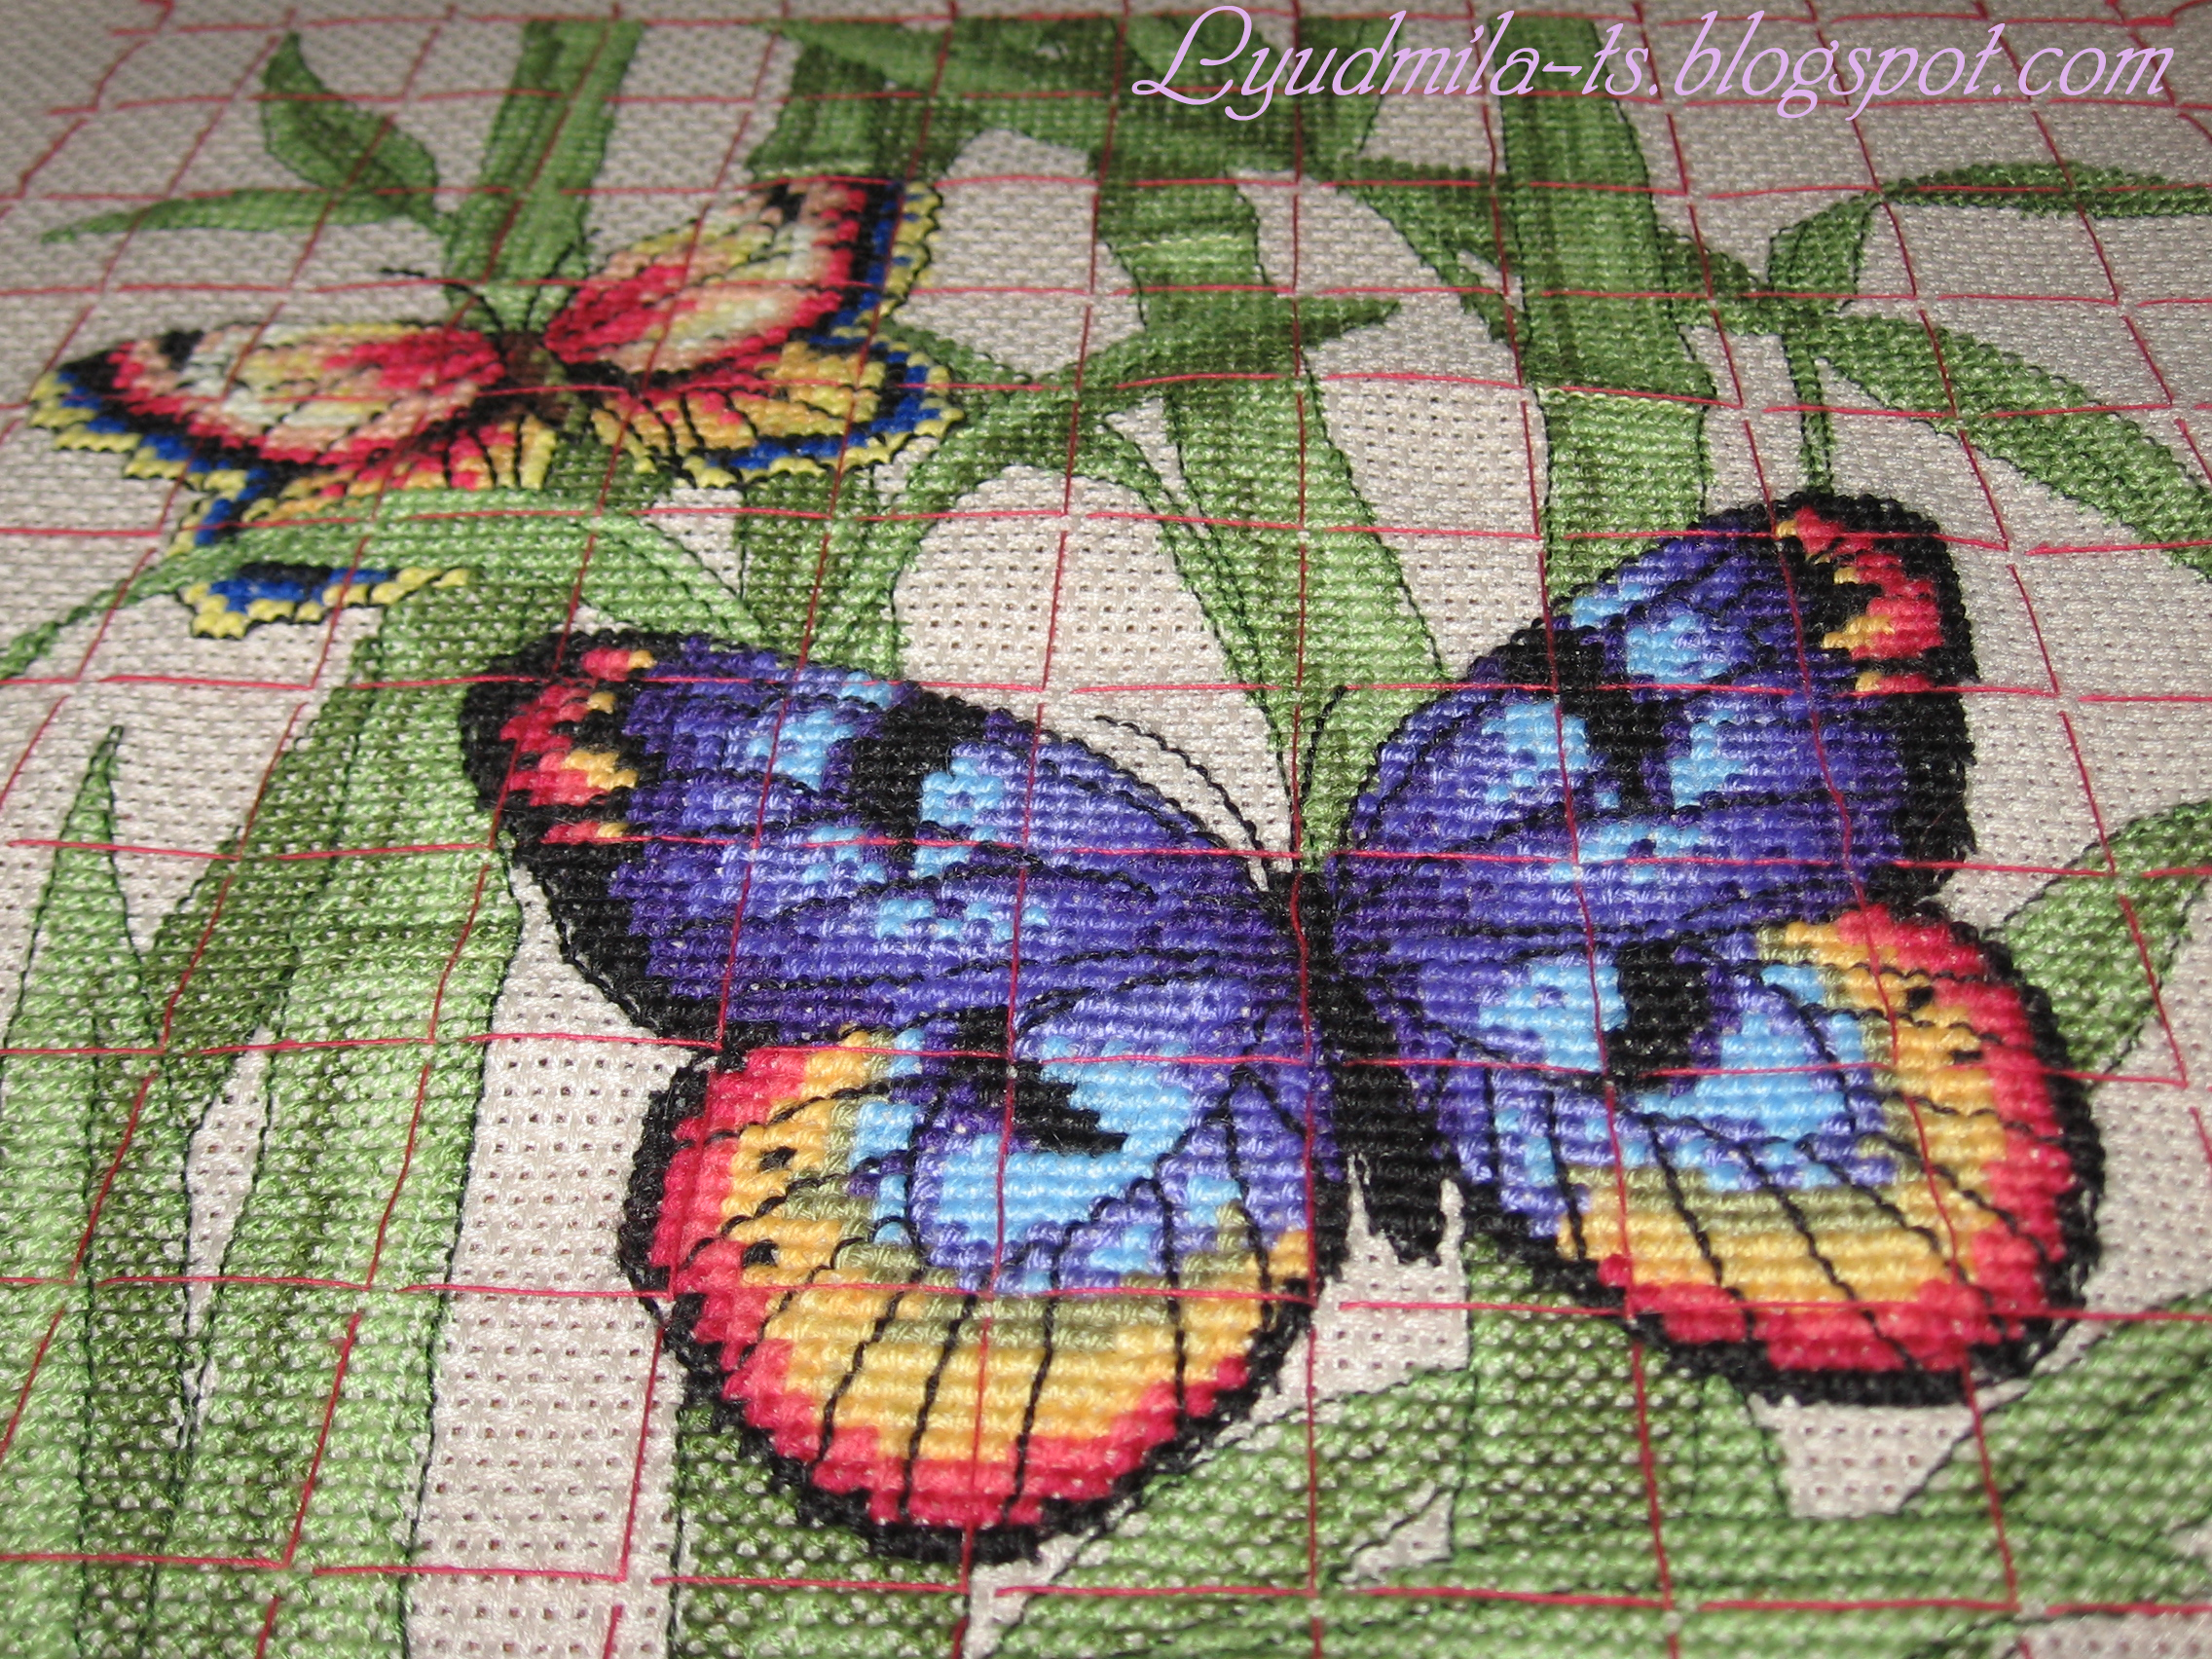 Вышивка бабочки от риолис 609